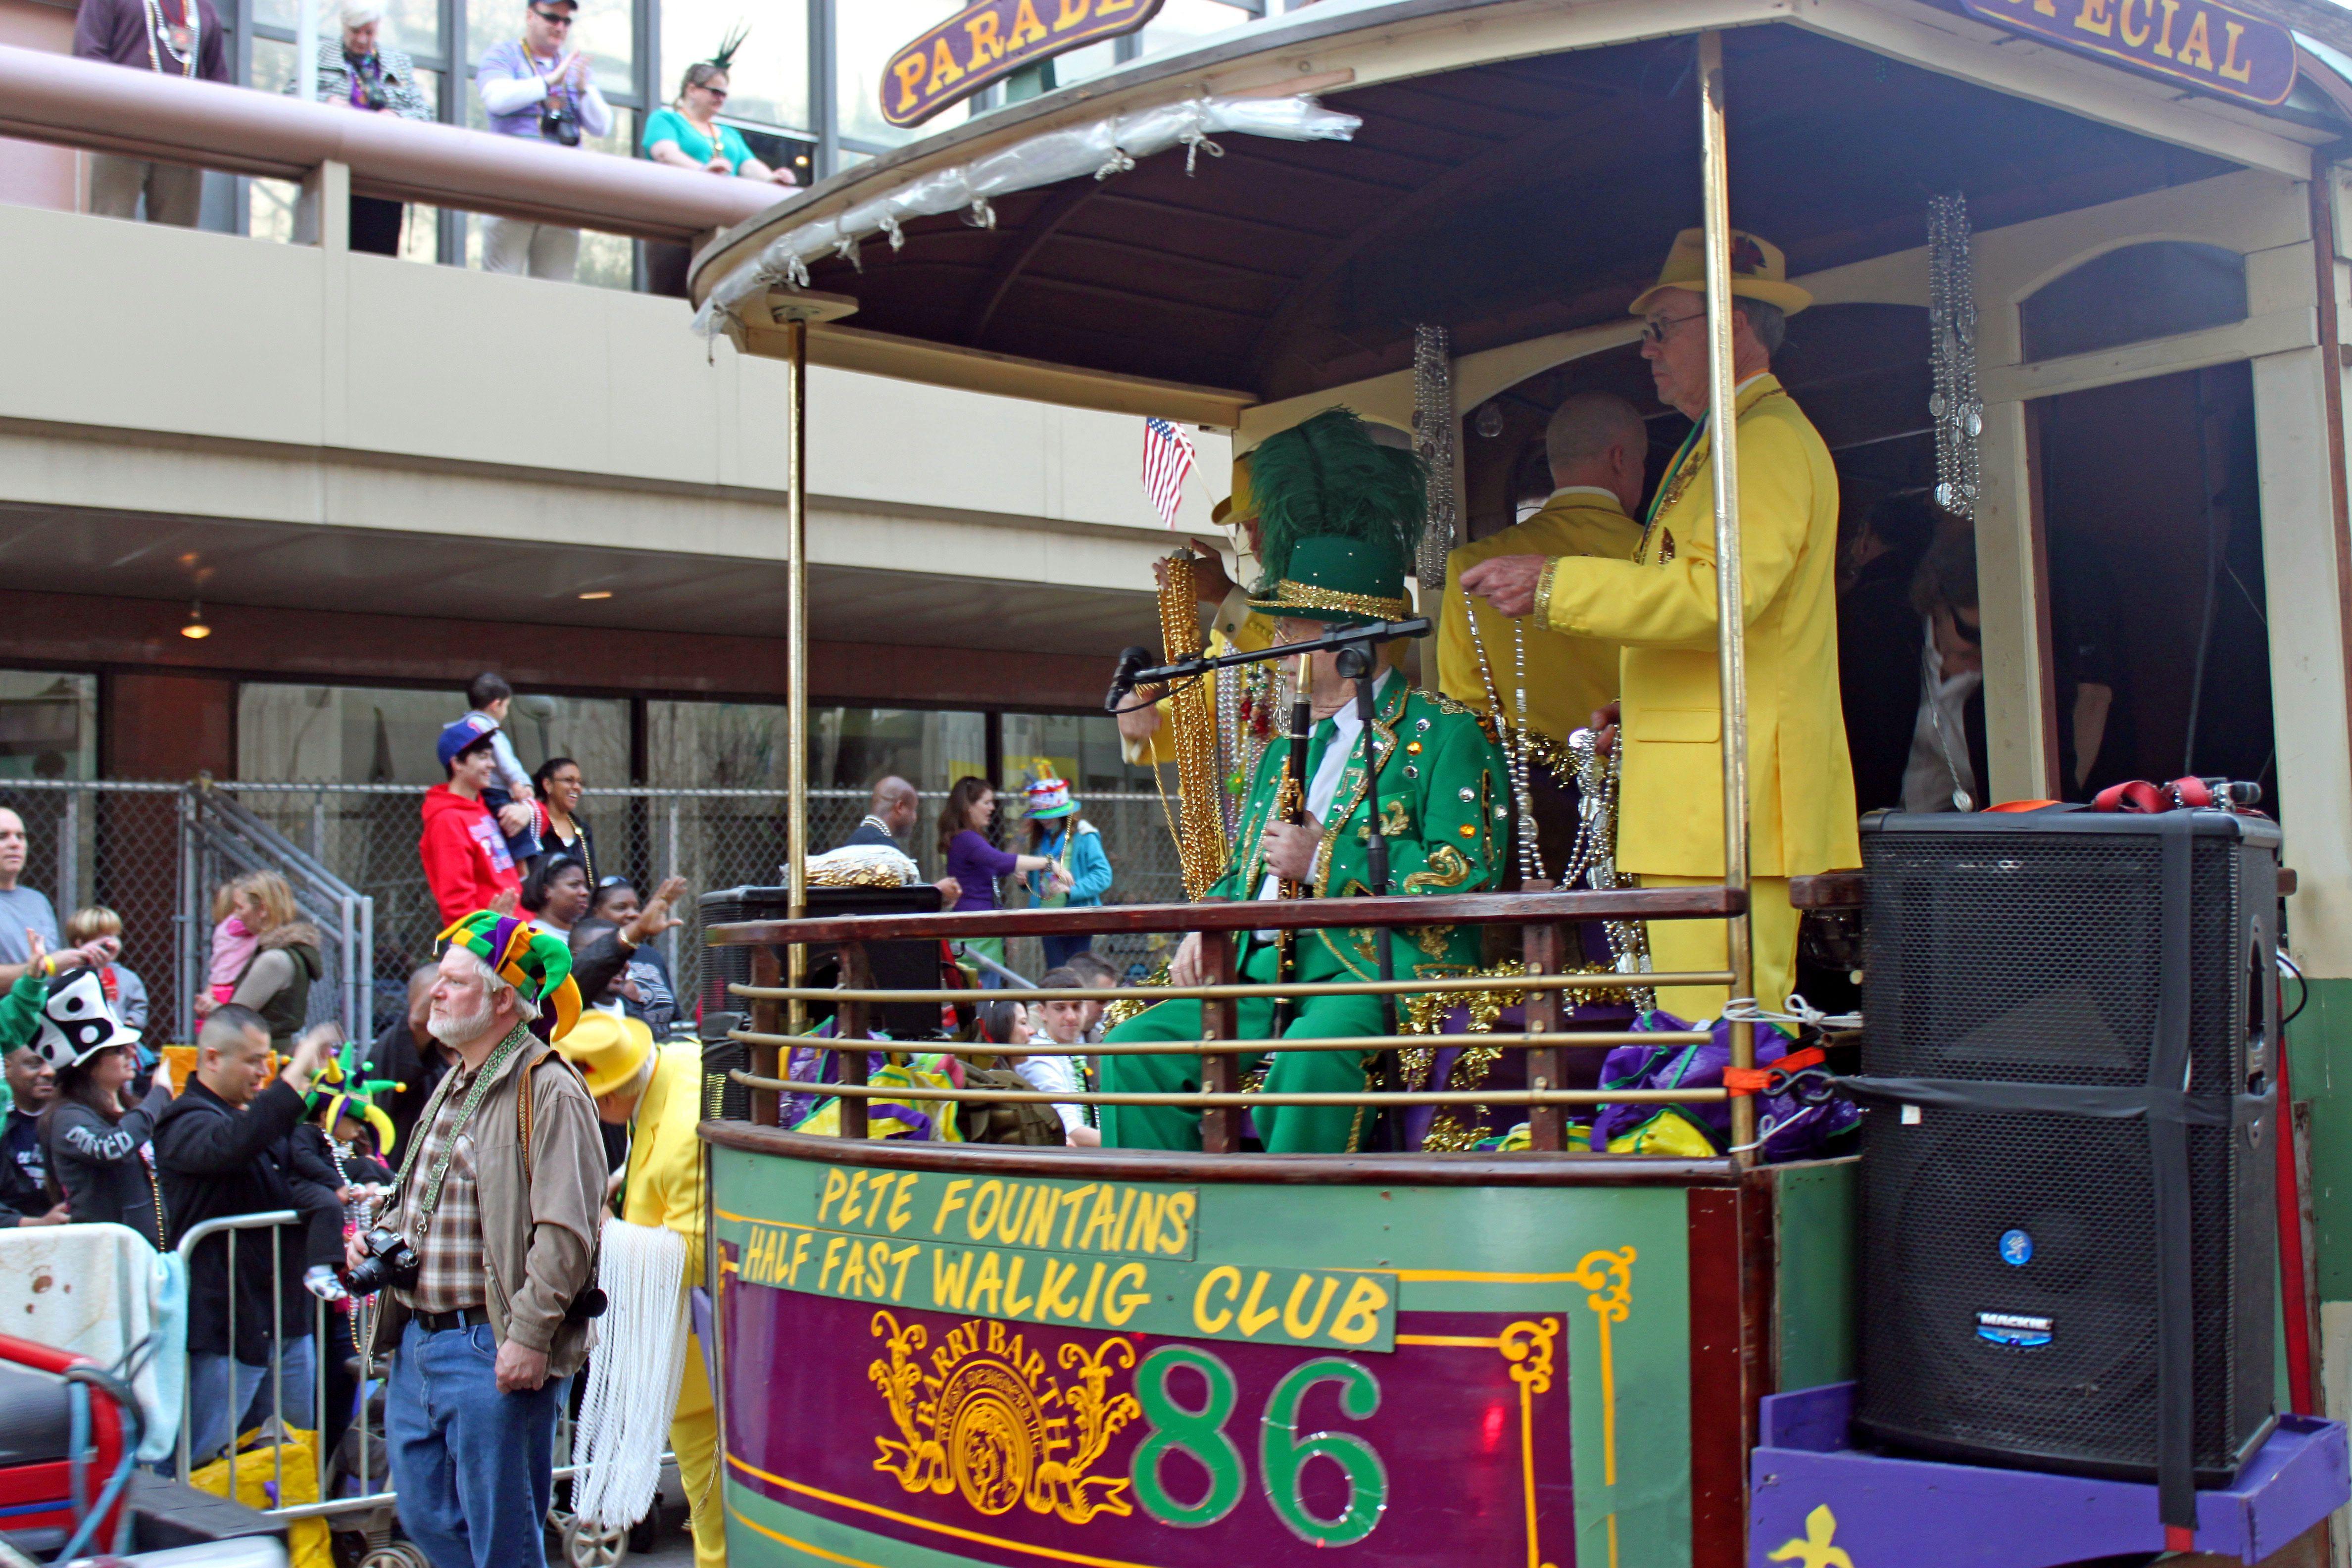 Pin By Fantasy Rv Tours On Mardi Gras Louisanna Usa Tours With Images Usa Tours Louisianna Tours